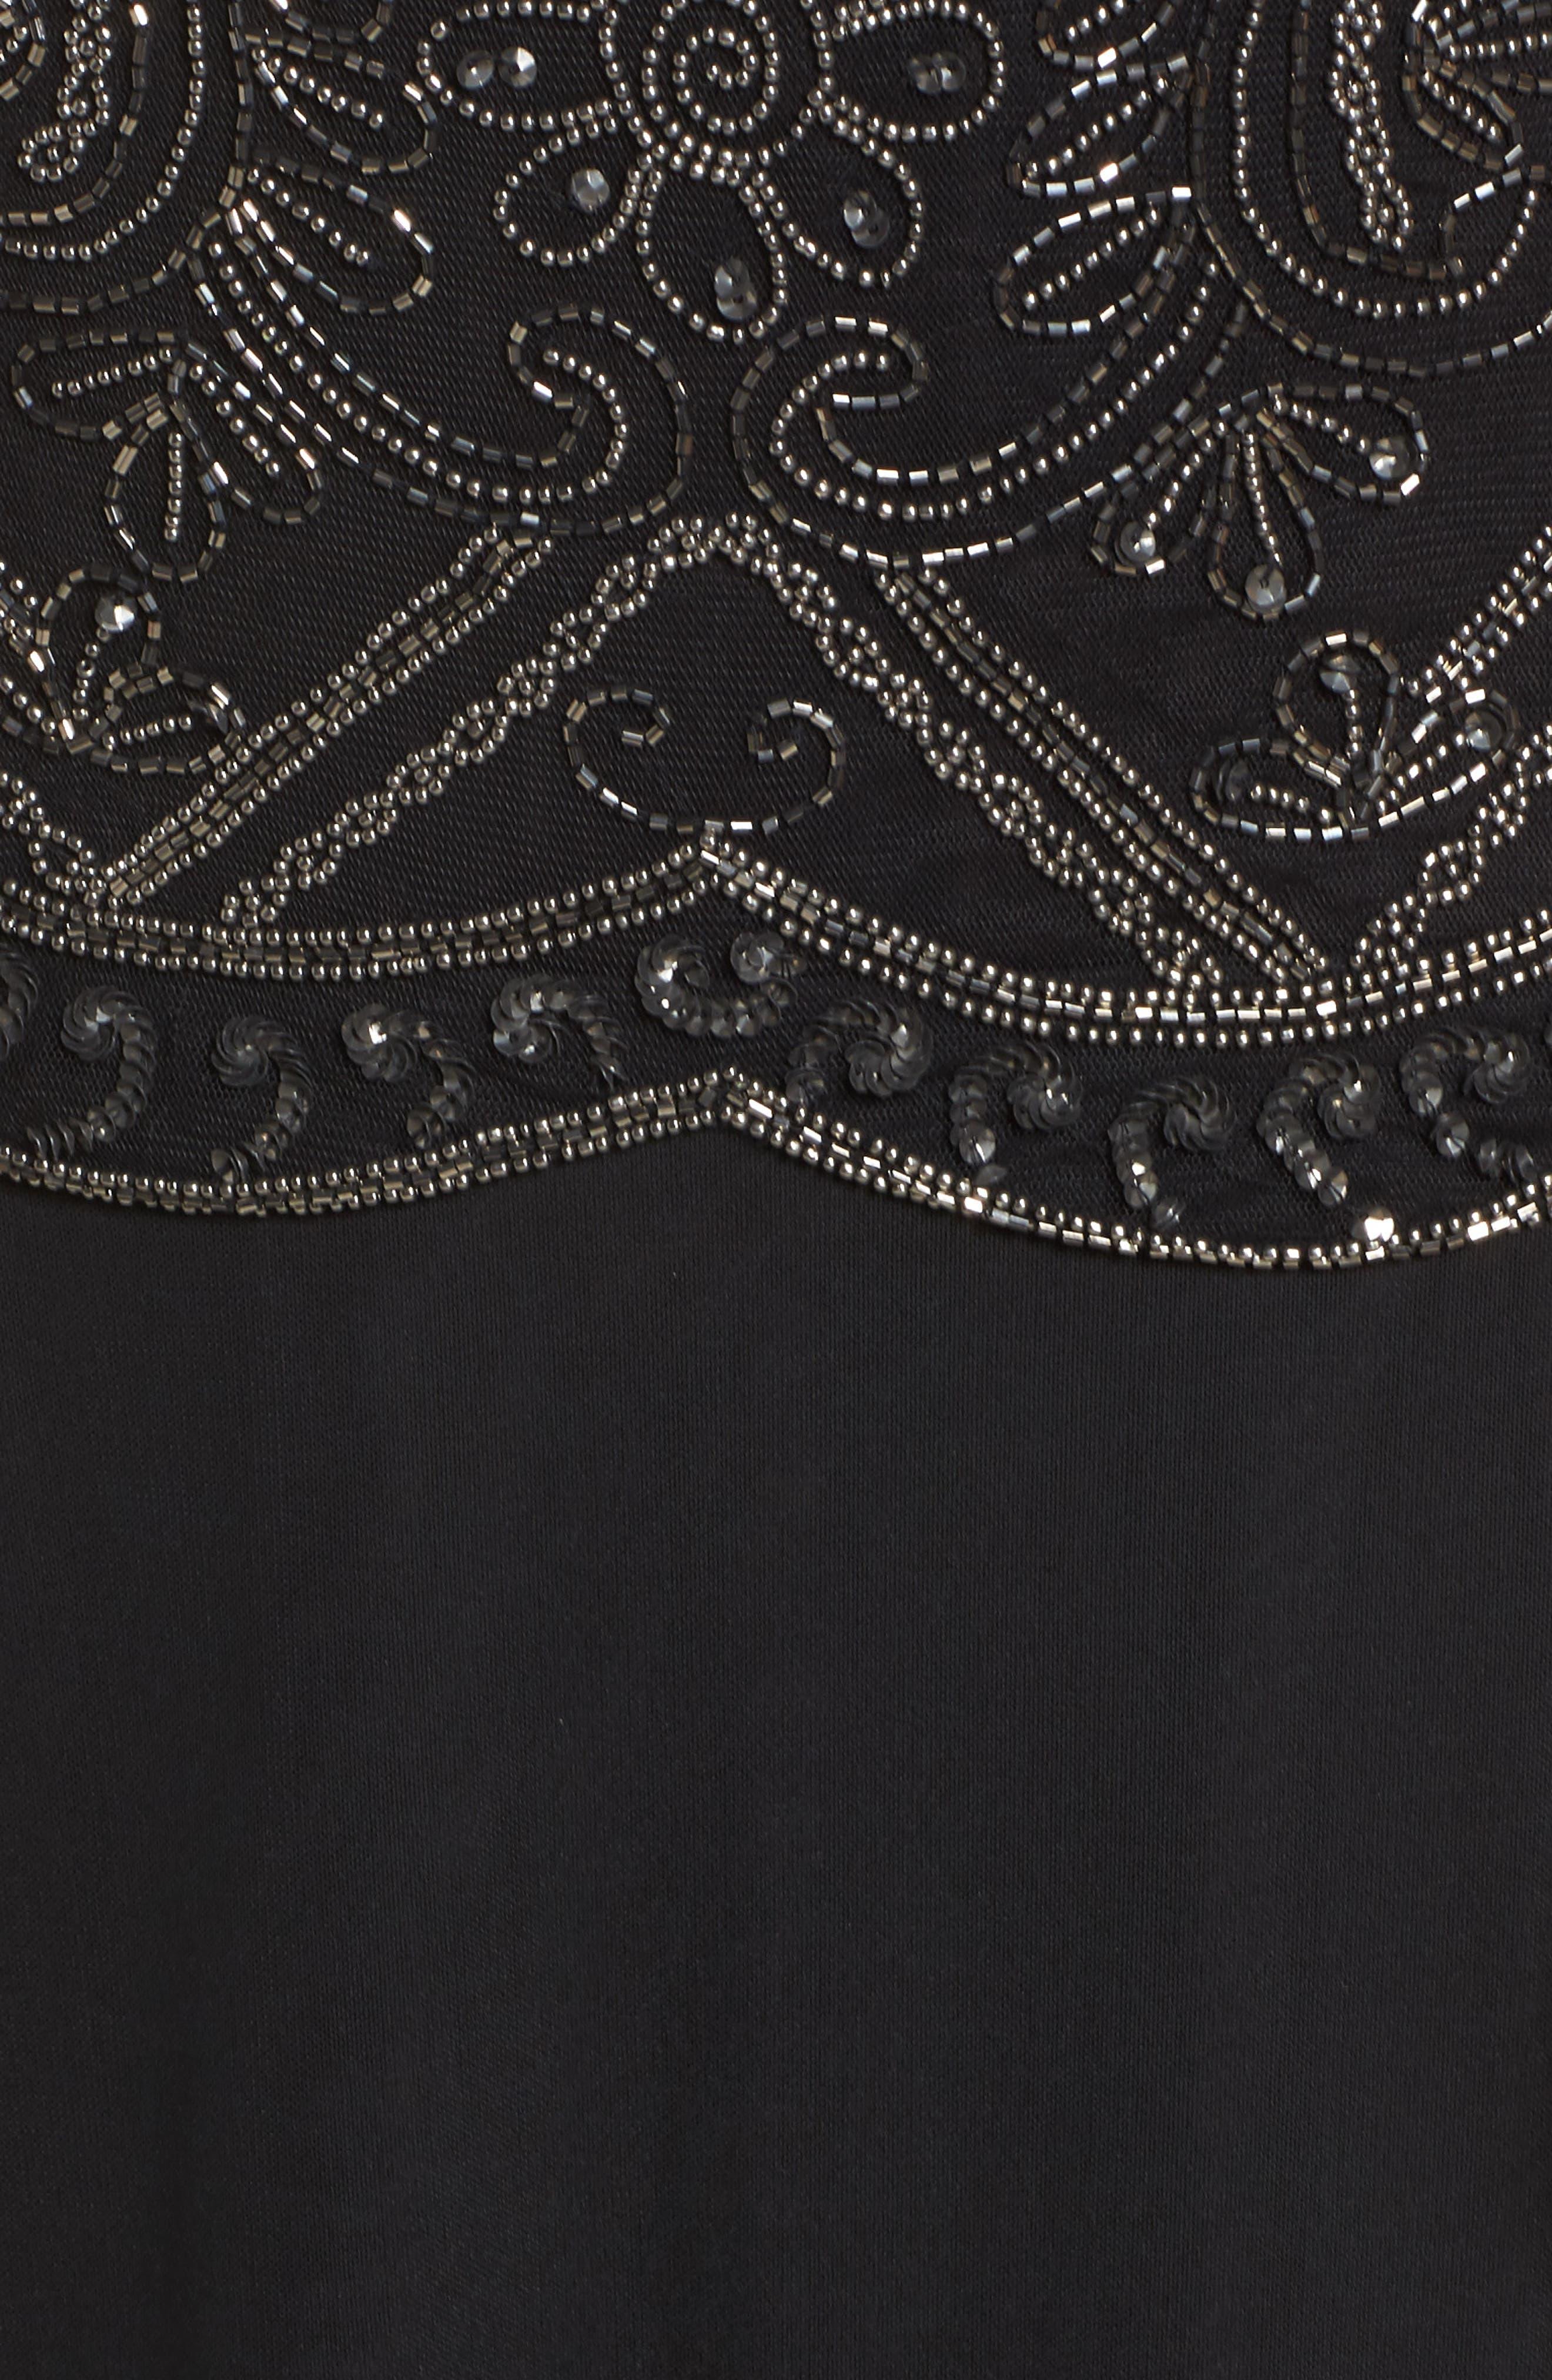 Embellished Cap Sleeve Long Dress,                             Alternate thumbnail 5, color,